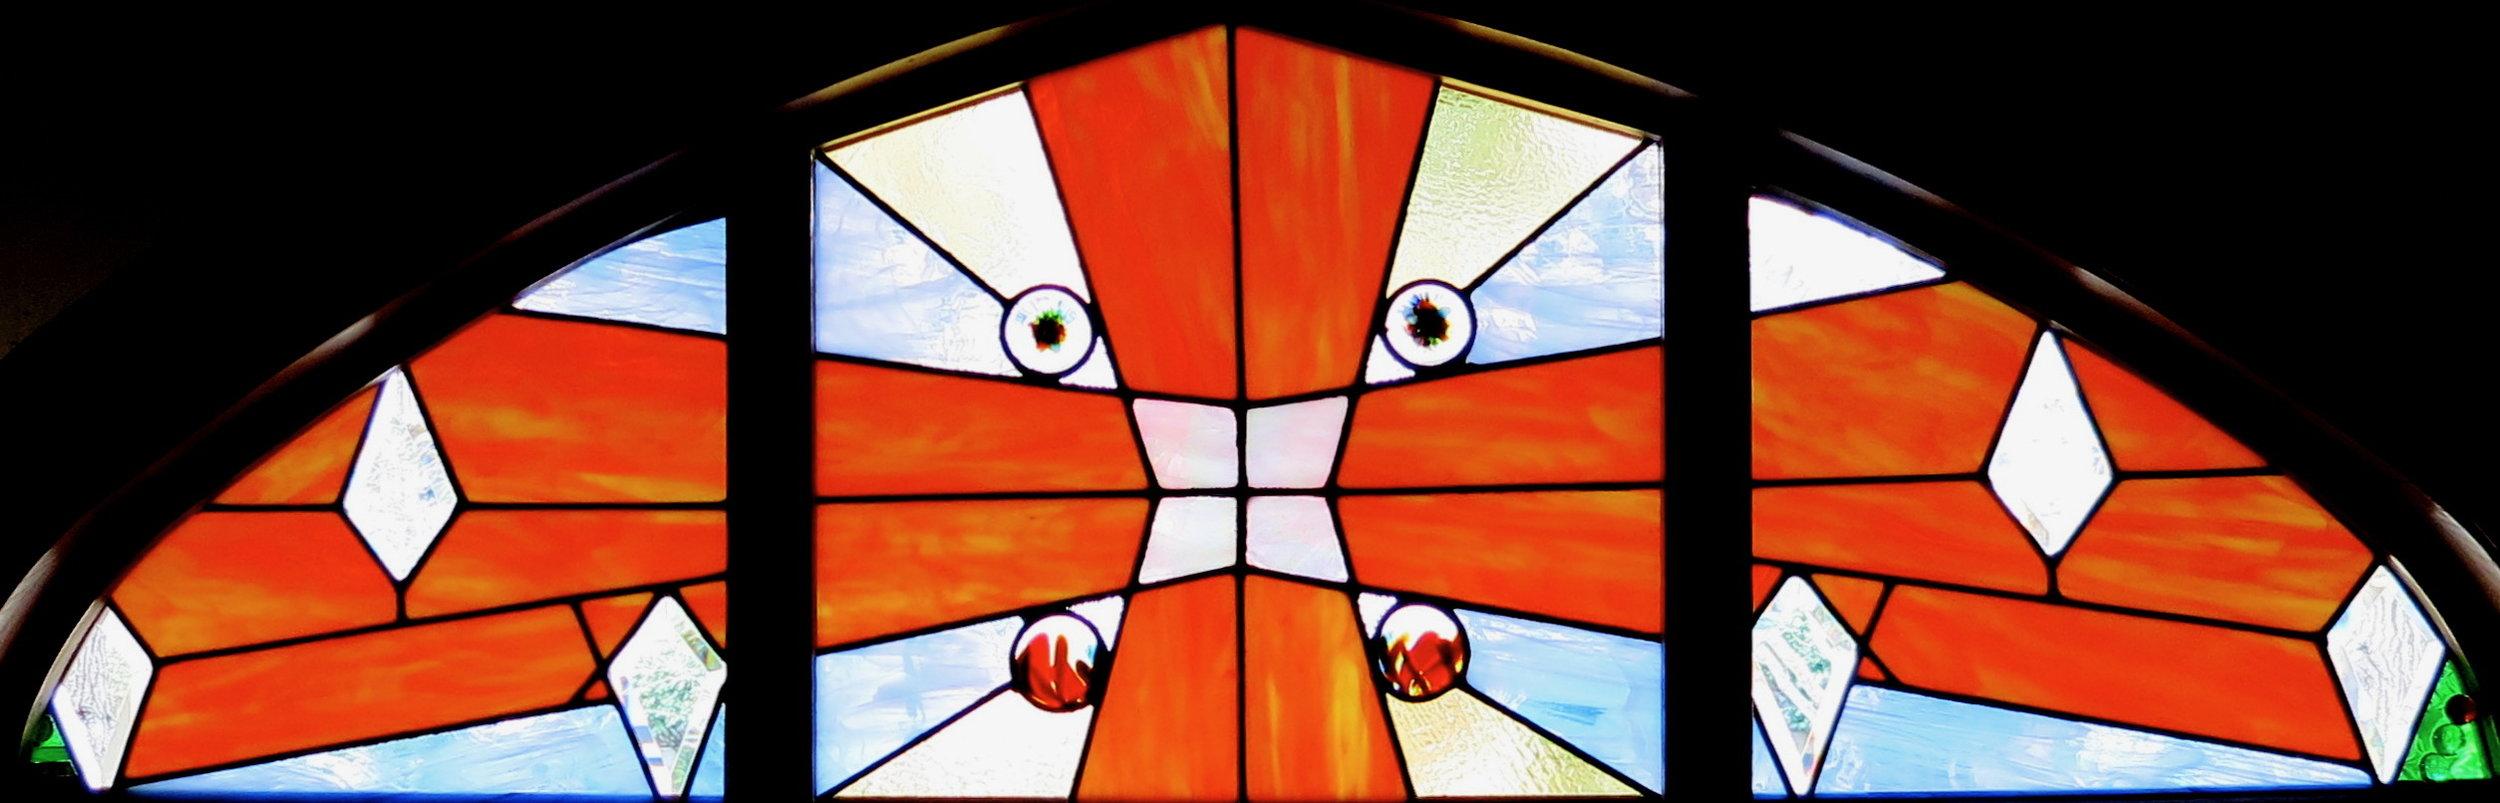 Alban window 4.jpg